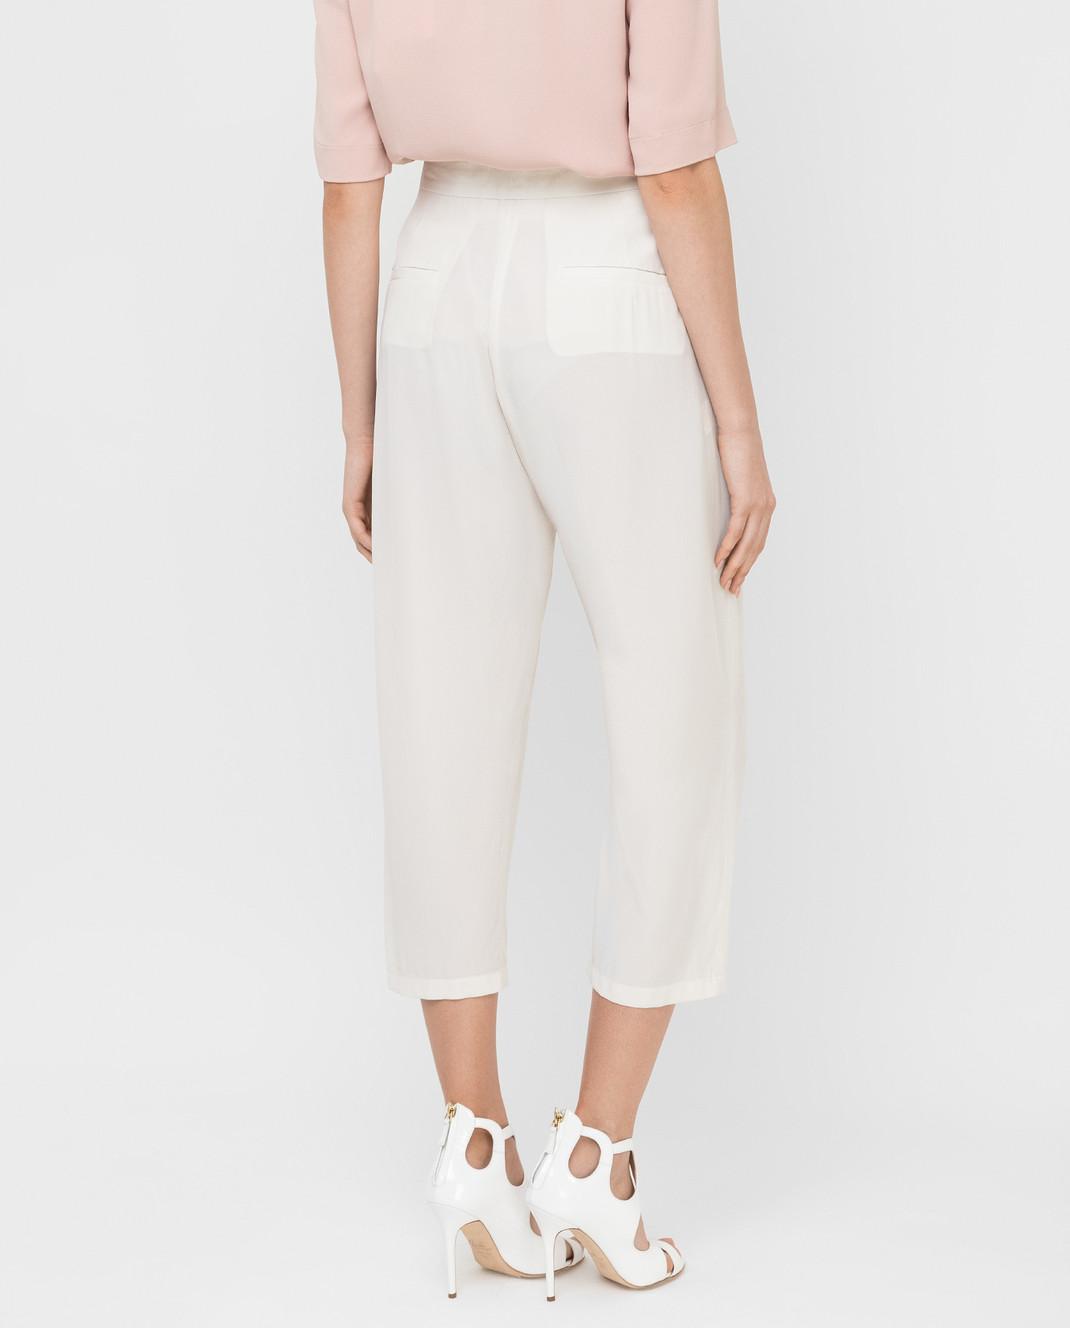 Marni Светло-бежевые брюки из шелка PAMAP01A00TSA29 изображение 4